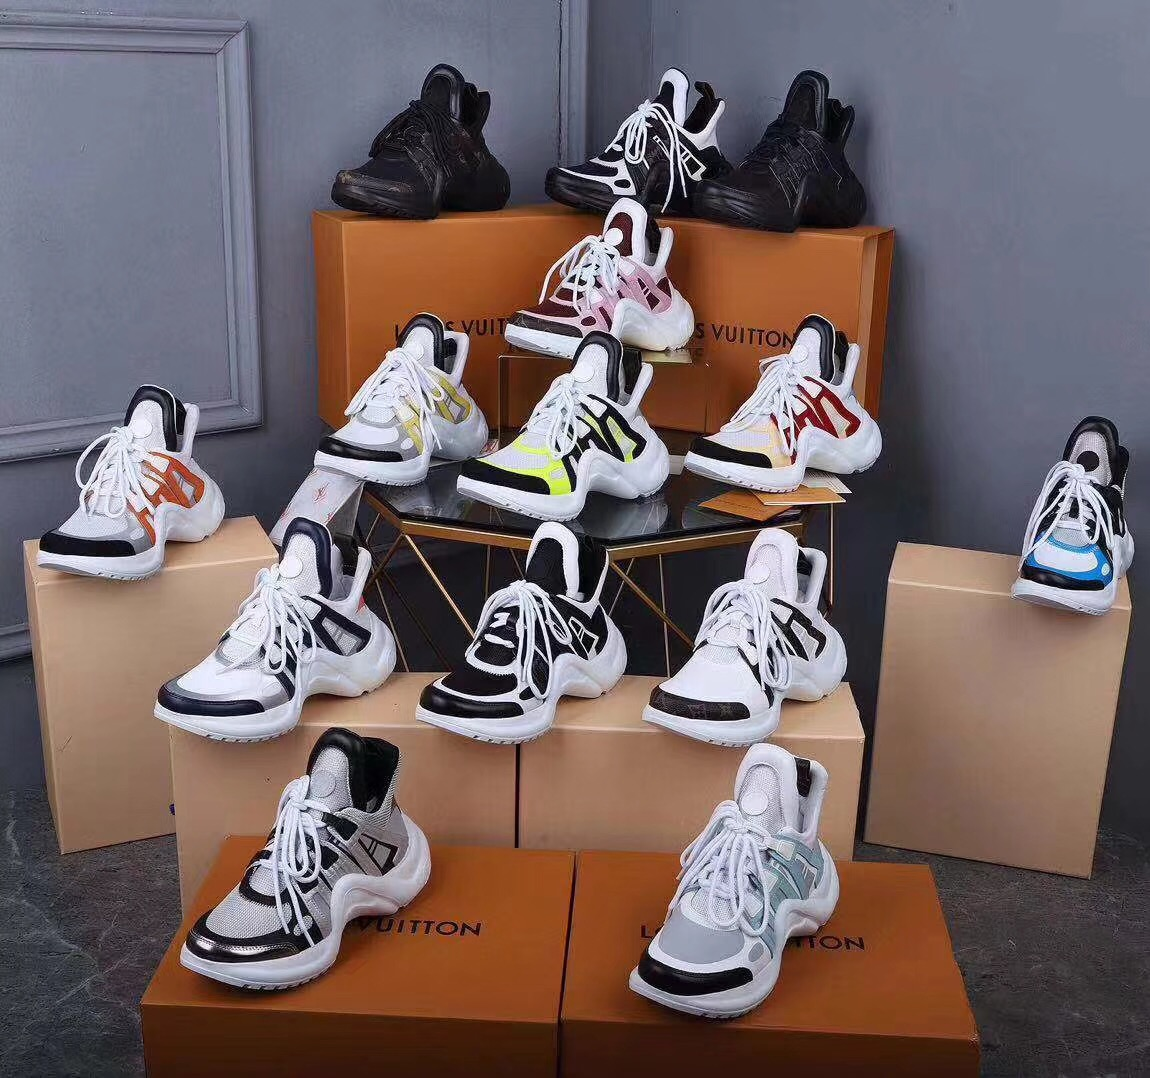 Louis Vuitton ルイヴィトン カップル 靴 代引き日本国内発送 ブランドスーパーコピー 後払い